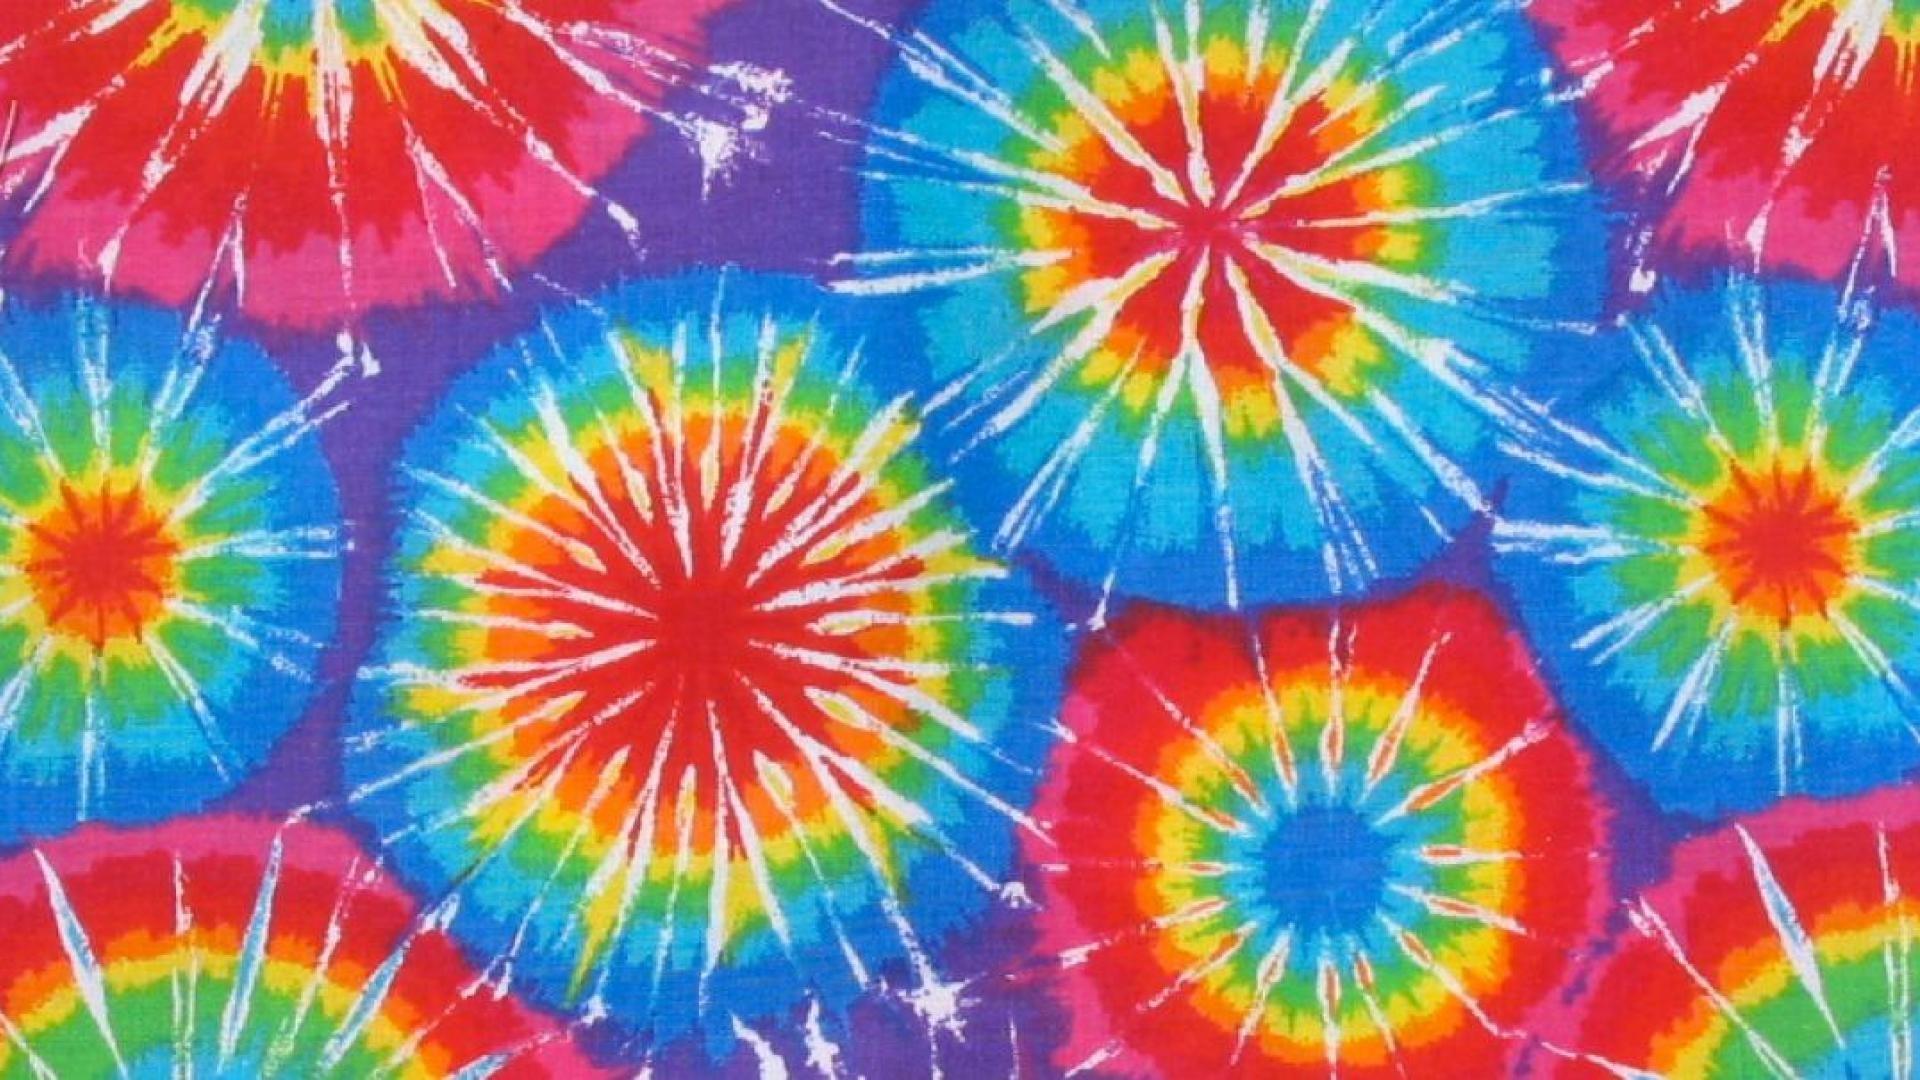 Wallpaper Tie Dye 50 images 1920x1080